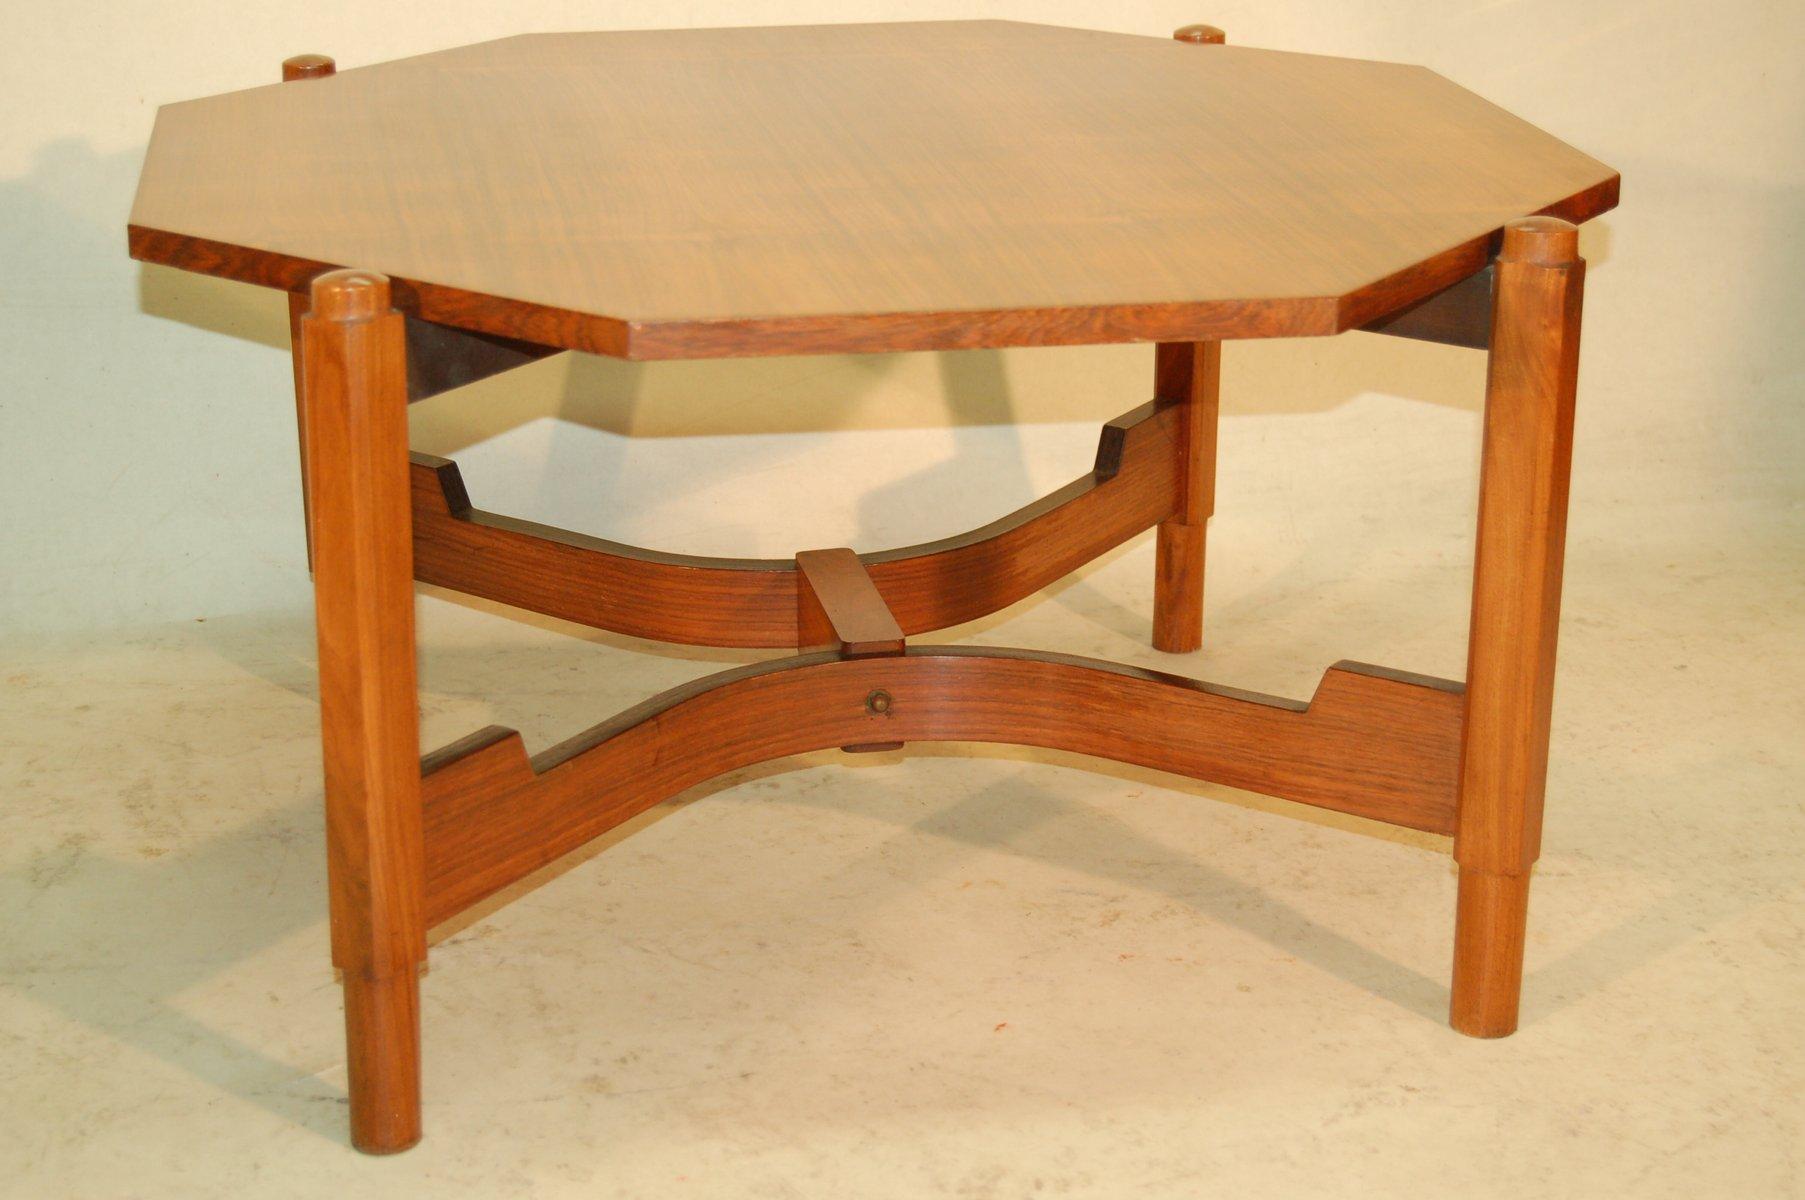 Italian teak coffee table 1970s for sale at pamono for Italian coffee table